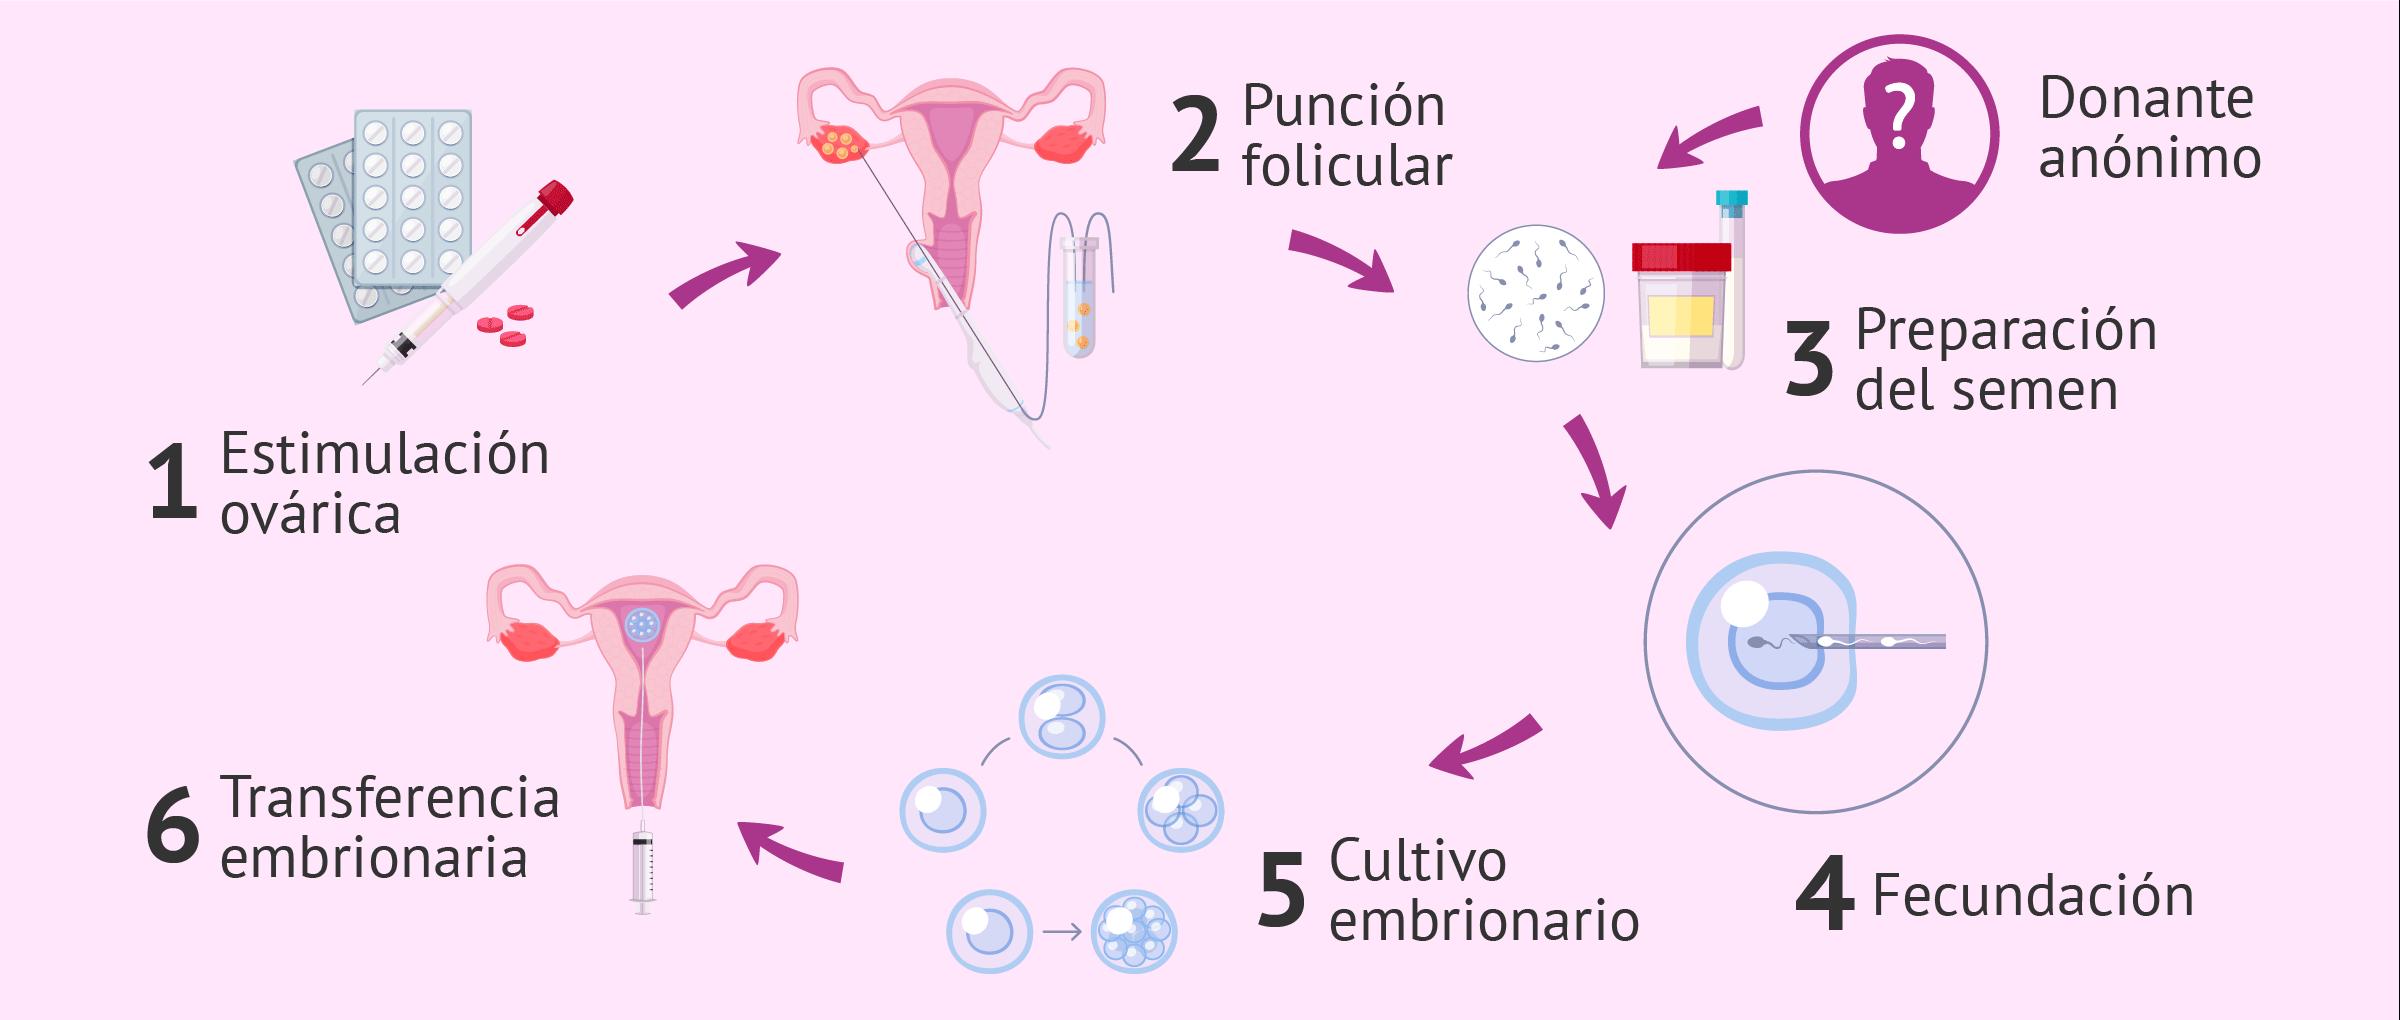 Fecundación in vitro para mujer soltera